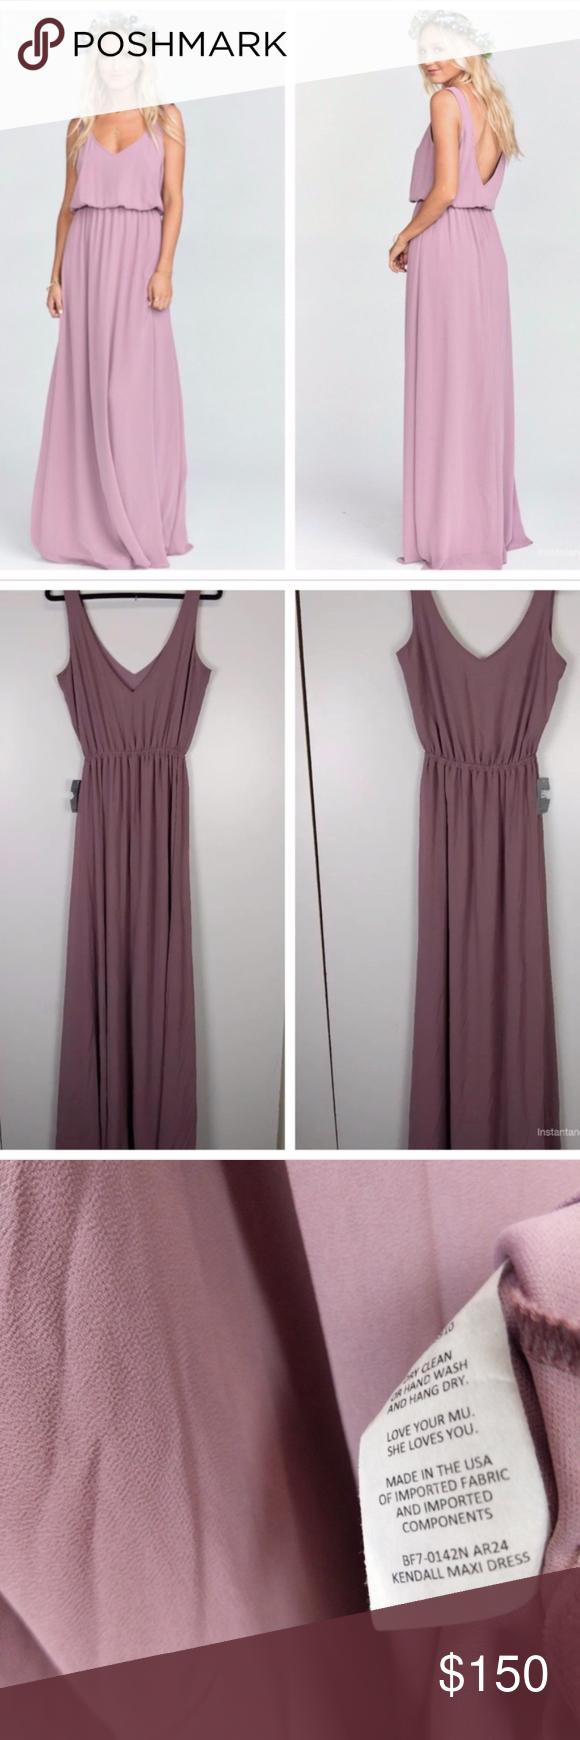 d7fa62c4345 Show Me Your Mumu Kendall Maxi Dress Color antique rose